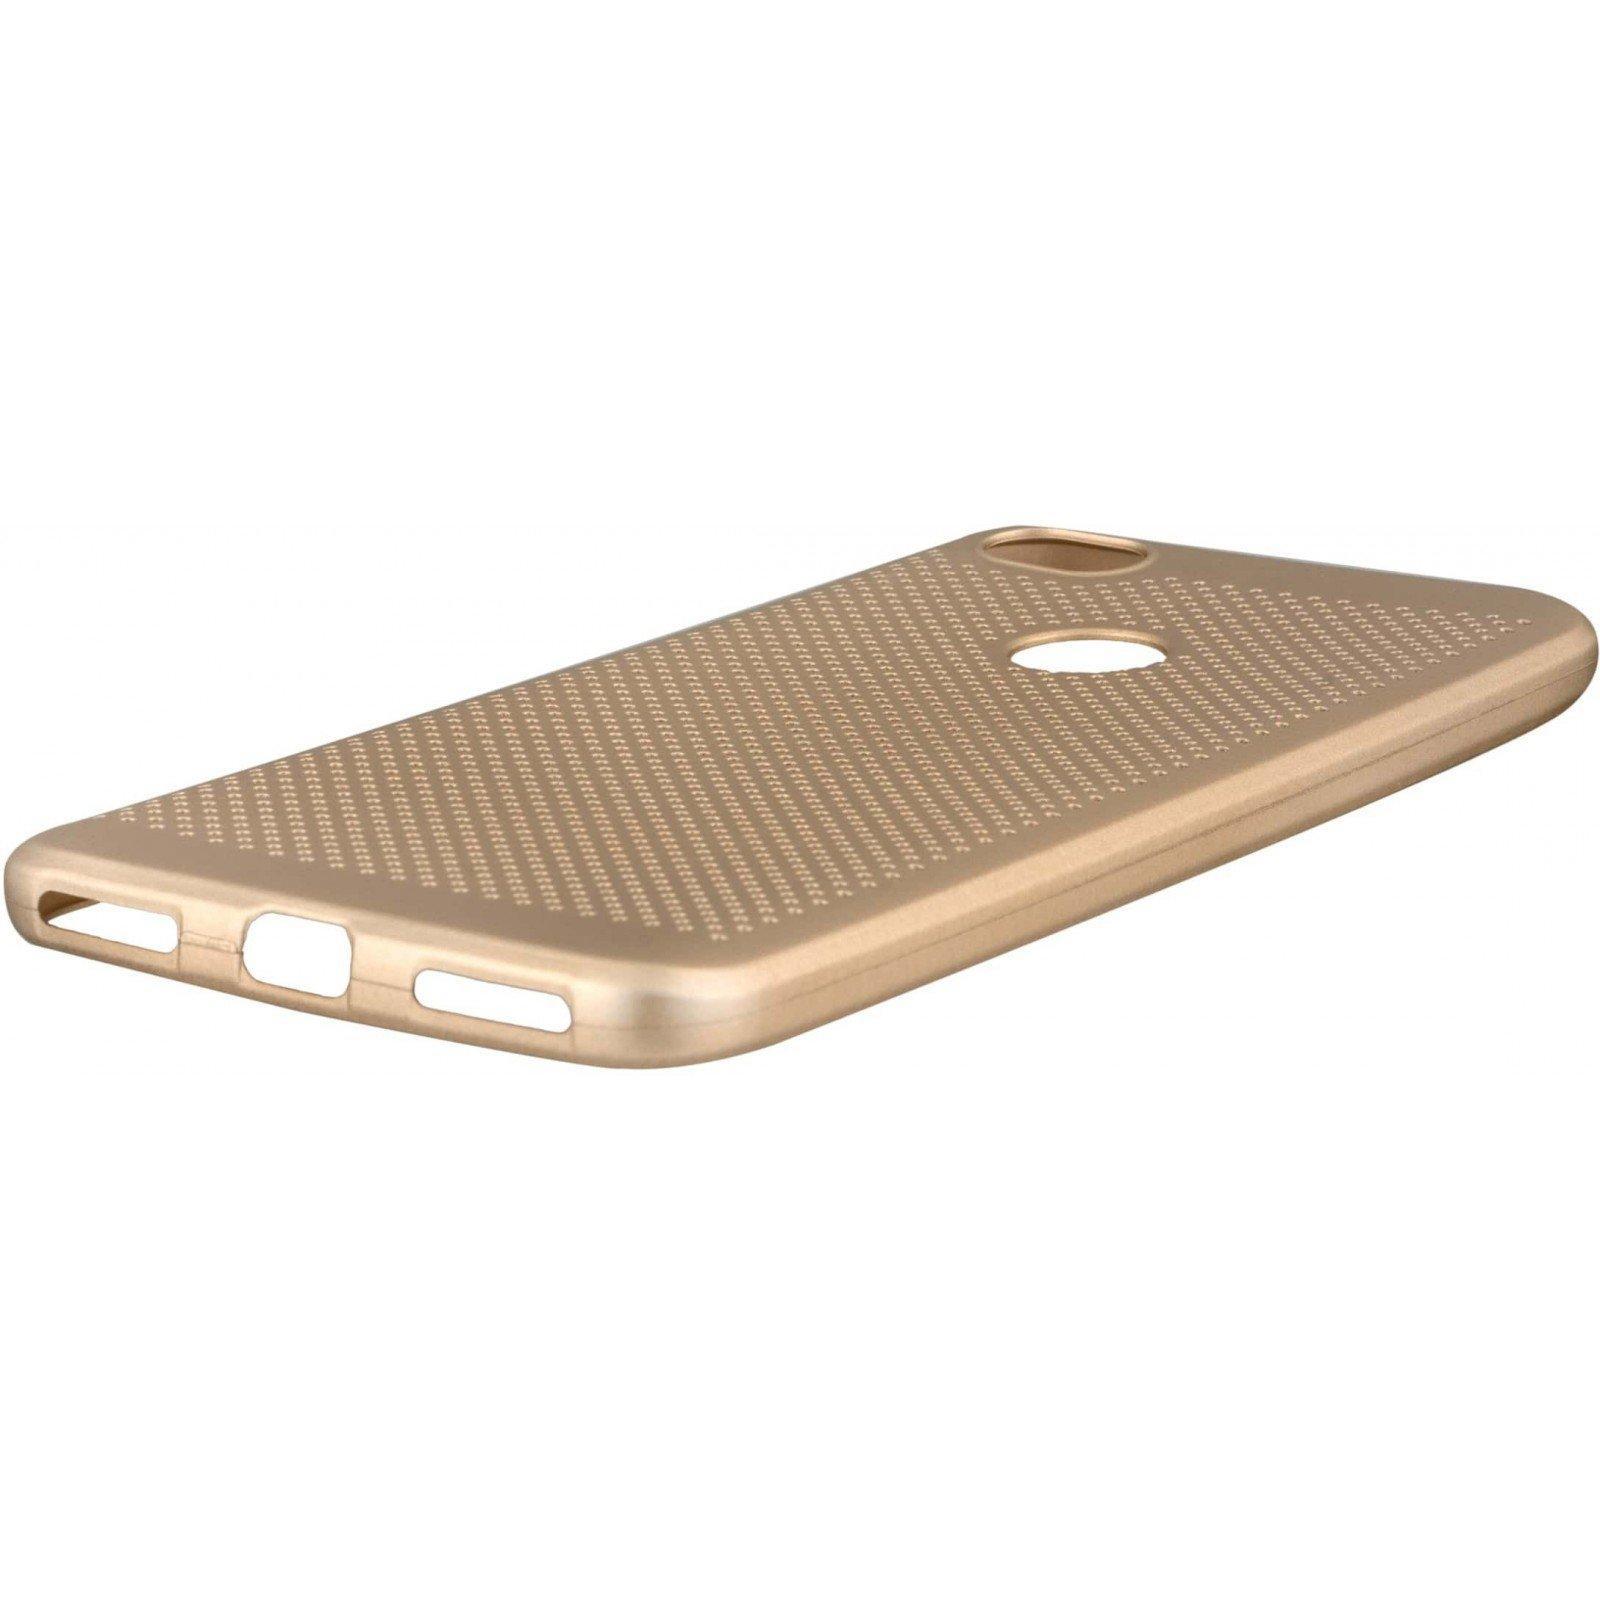 Чехол для моб. телефона MakeFuture TPU/Moon Case для Xiaomi Redmi Note 5A Prime Gold (MCM-XRN5APGD) изображение 7